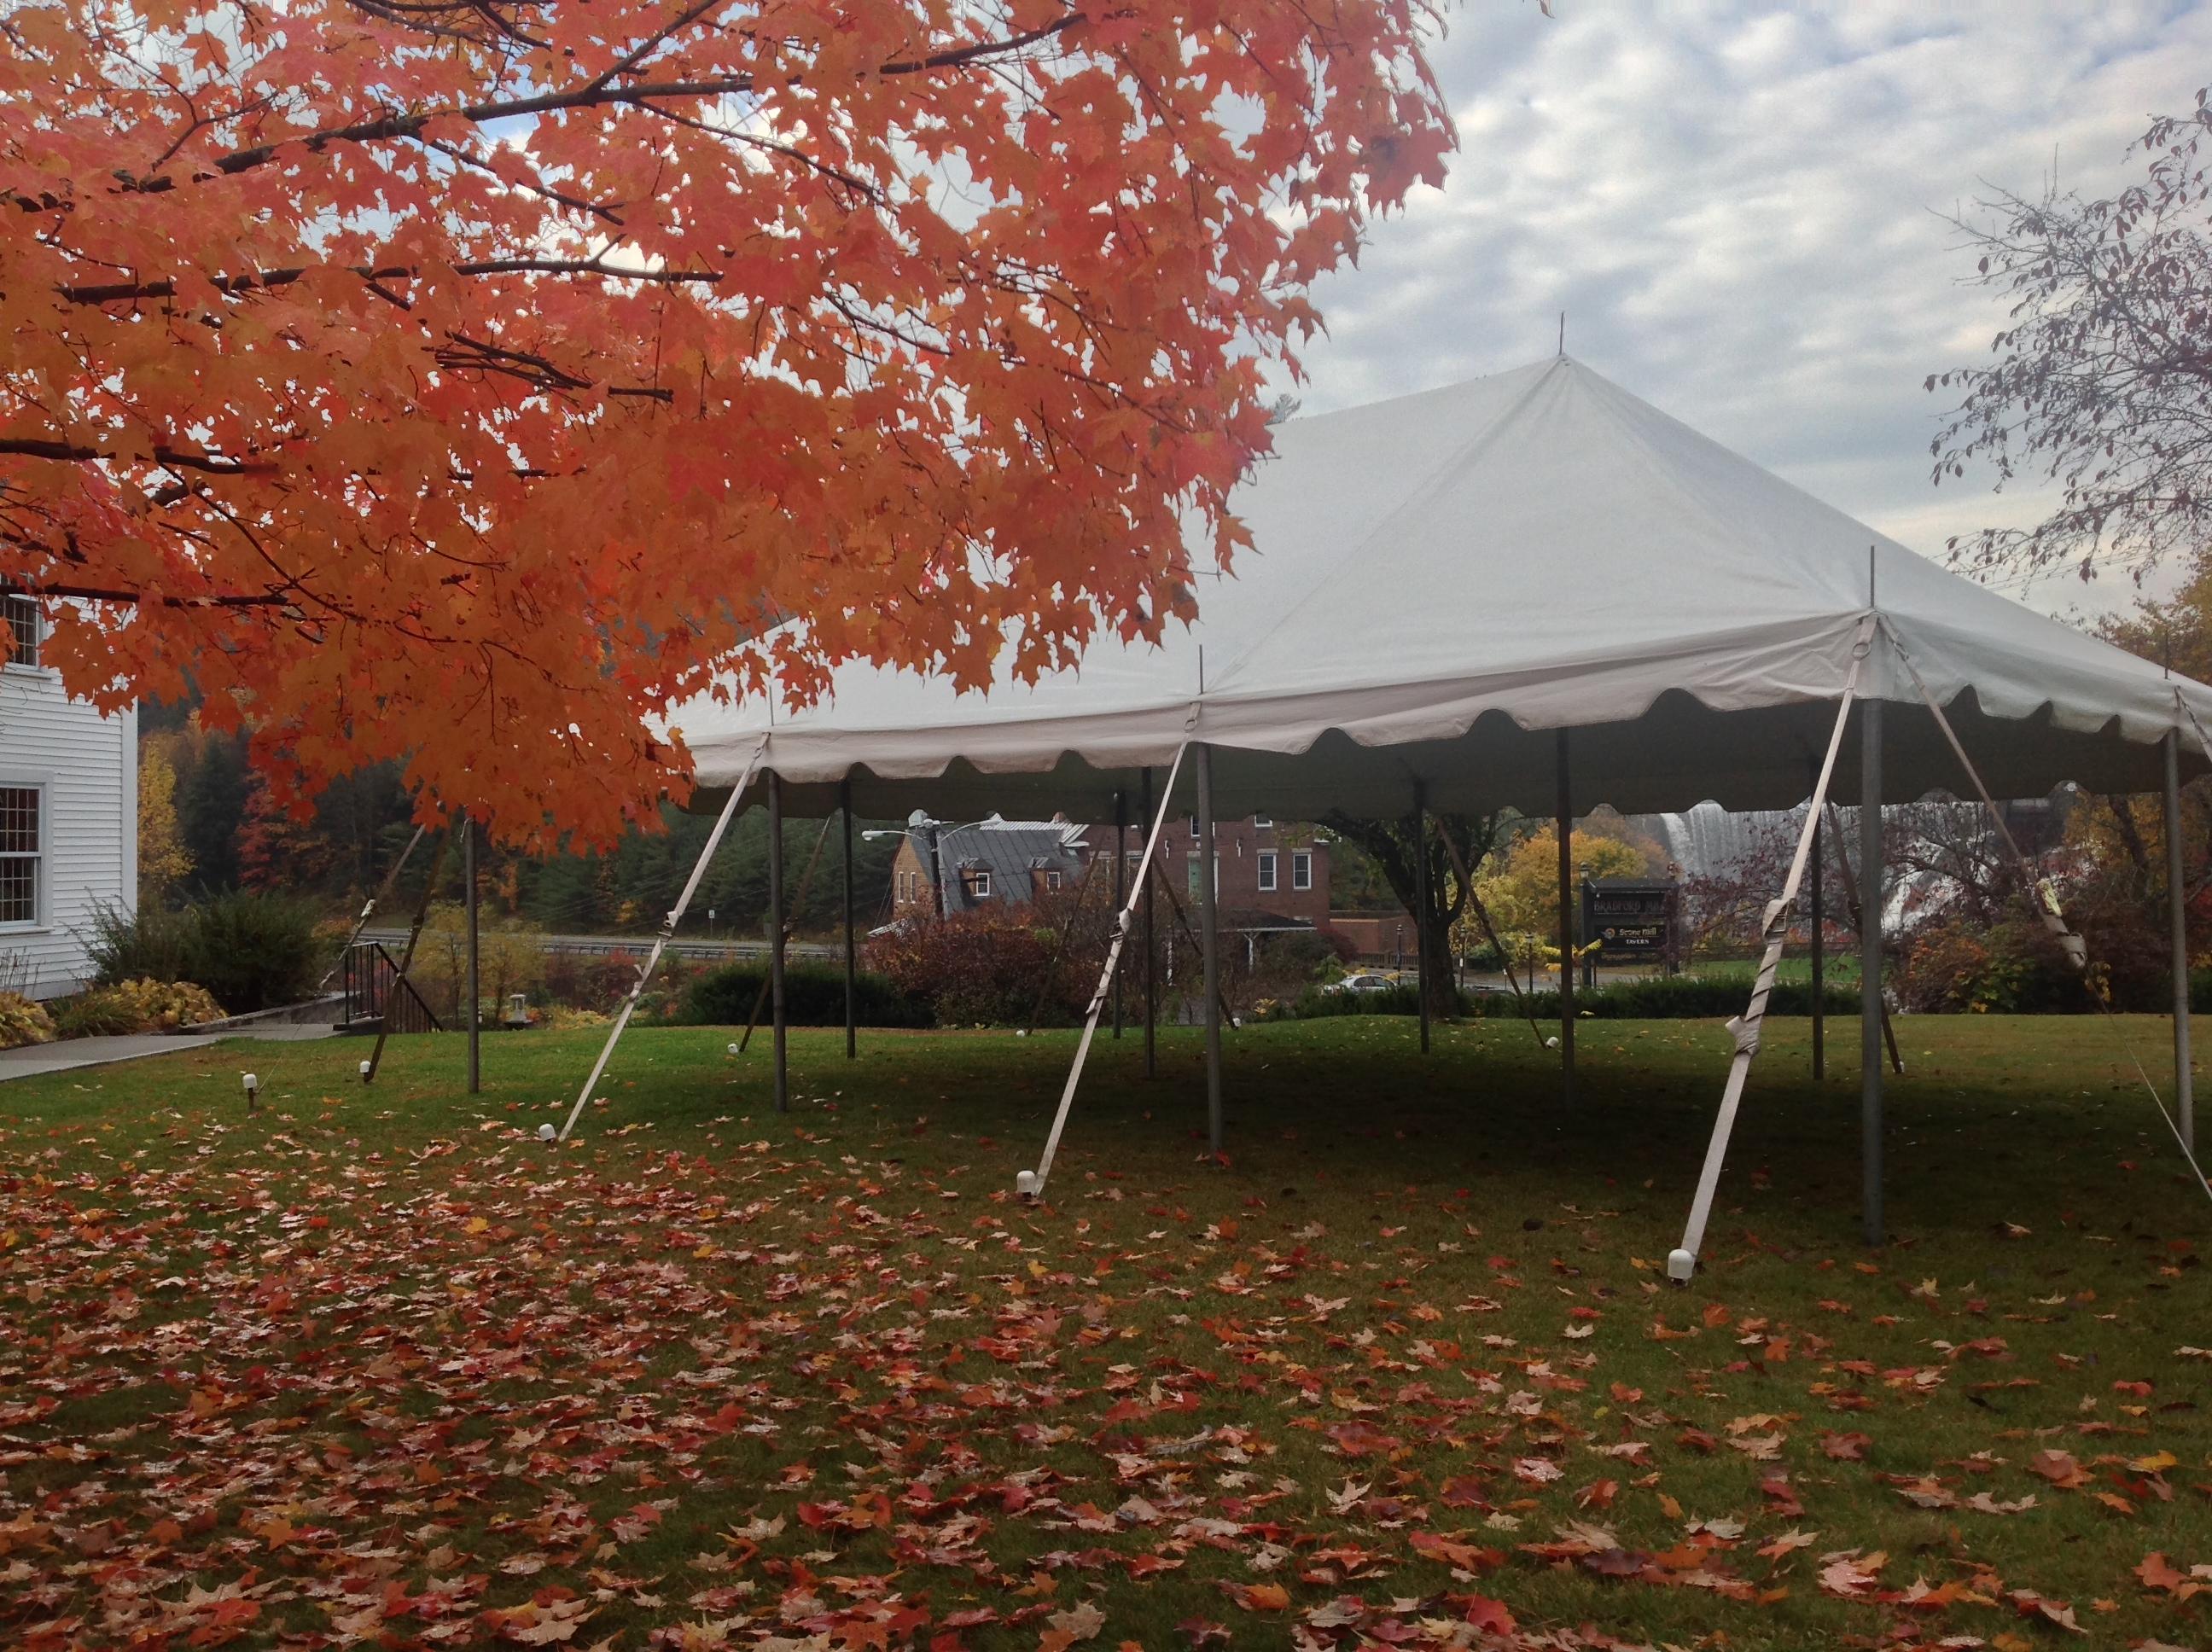 20X30 Pole Tent